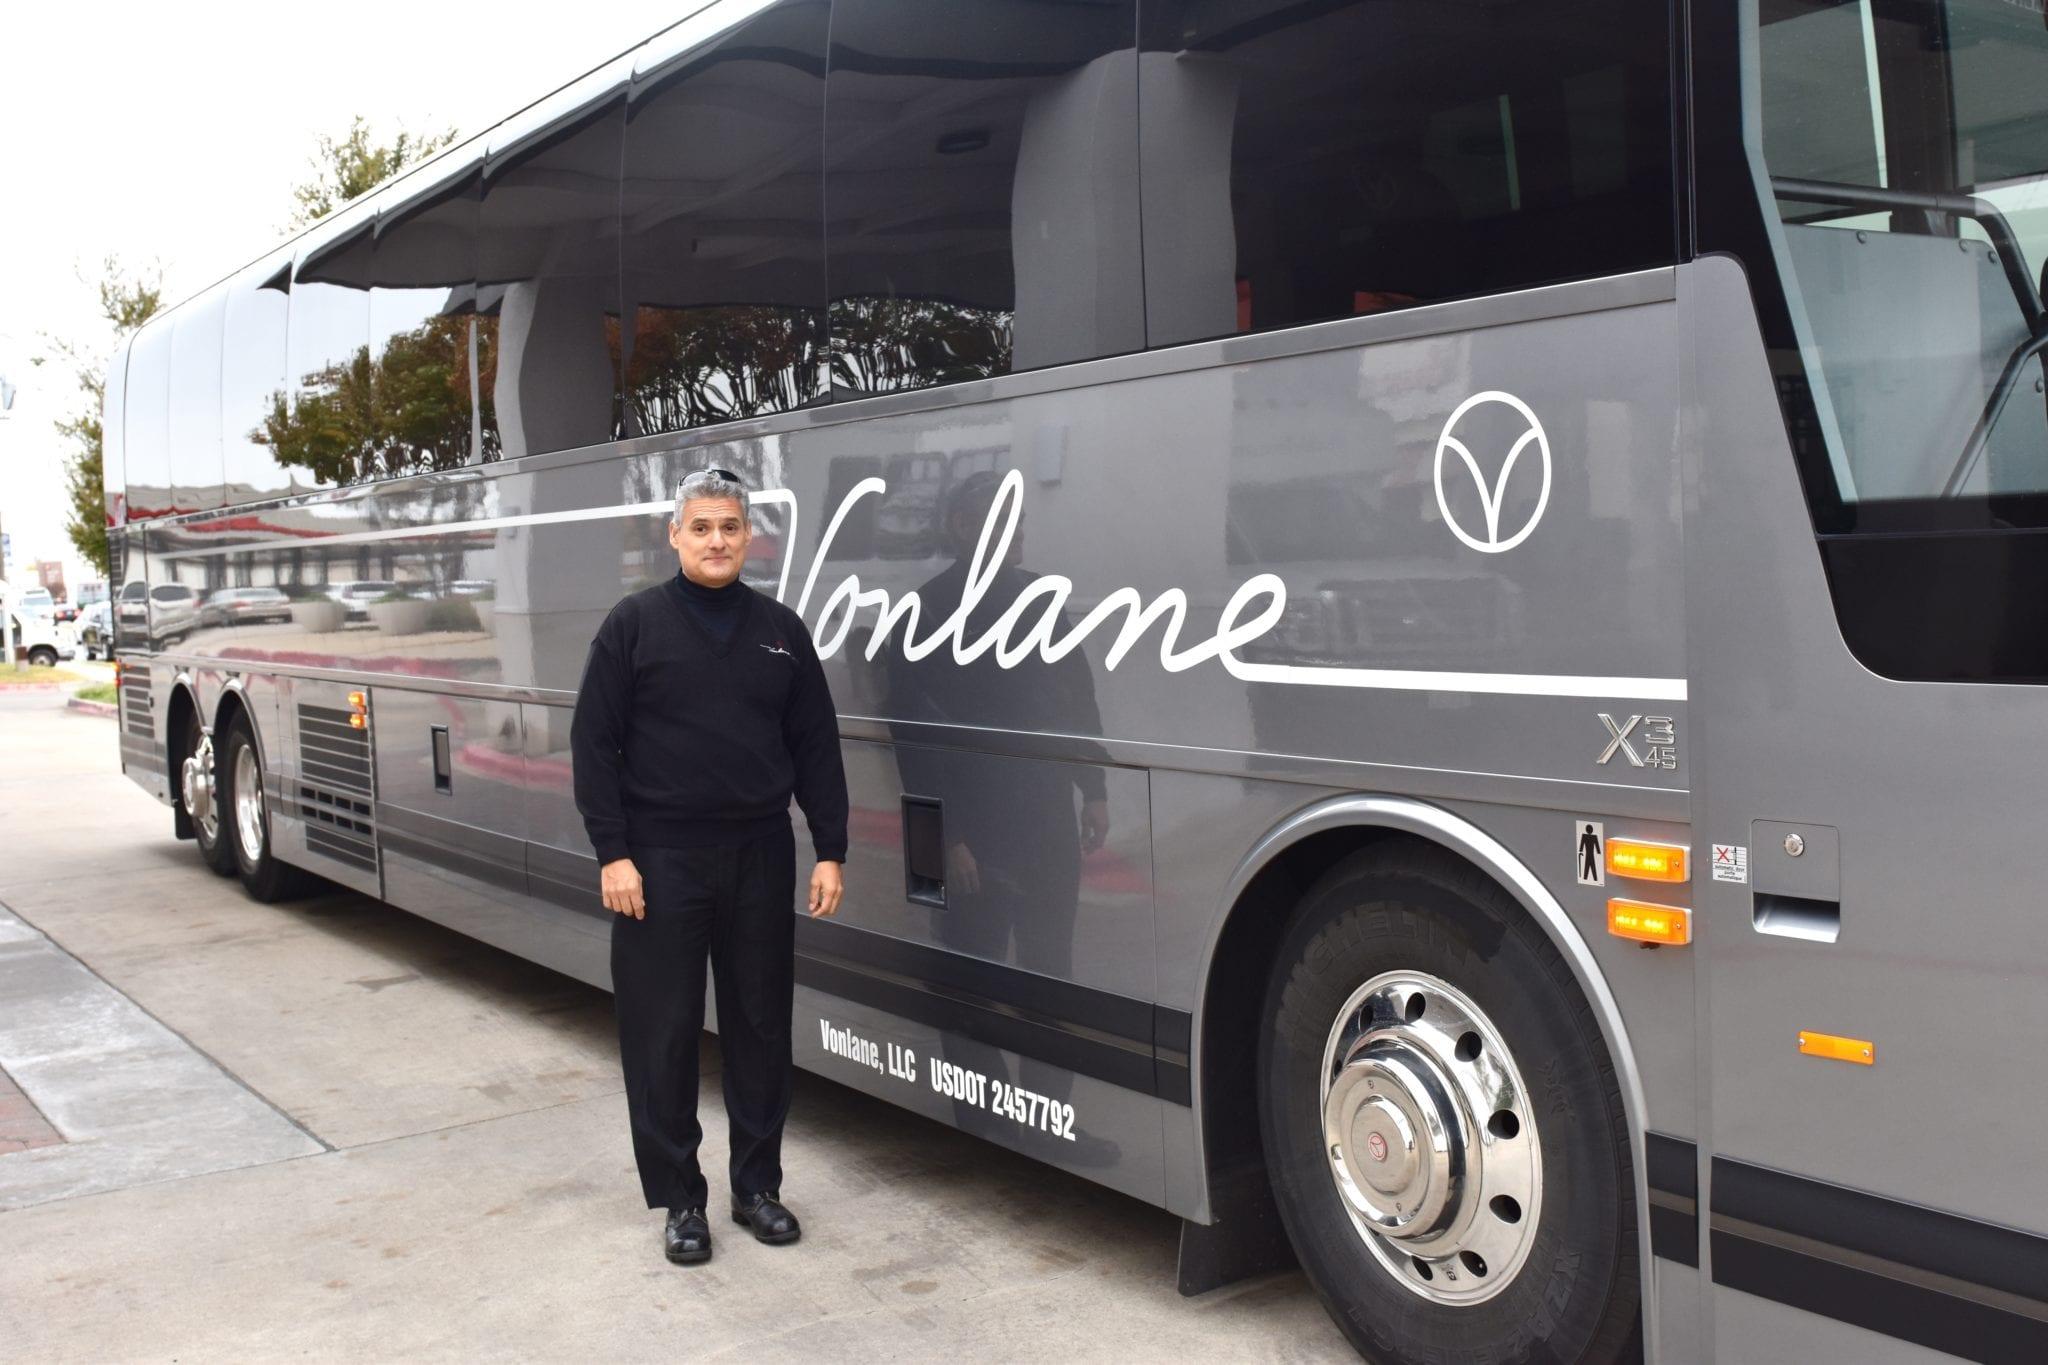 Traveling With Vonlane // Jet Service On Wheels